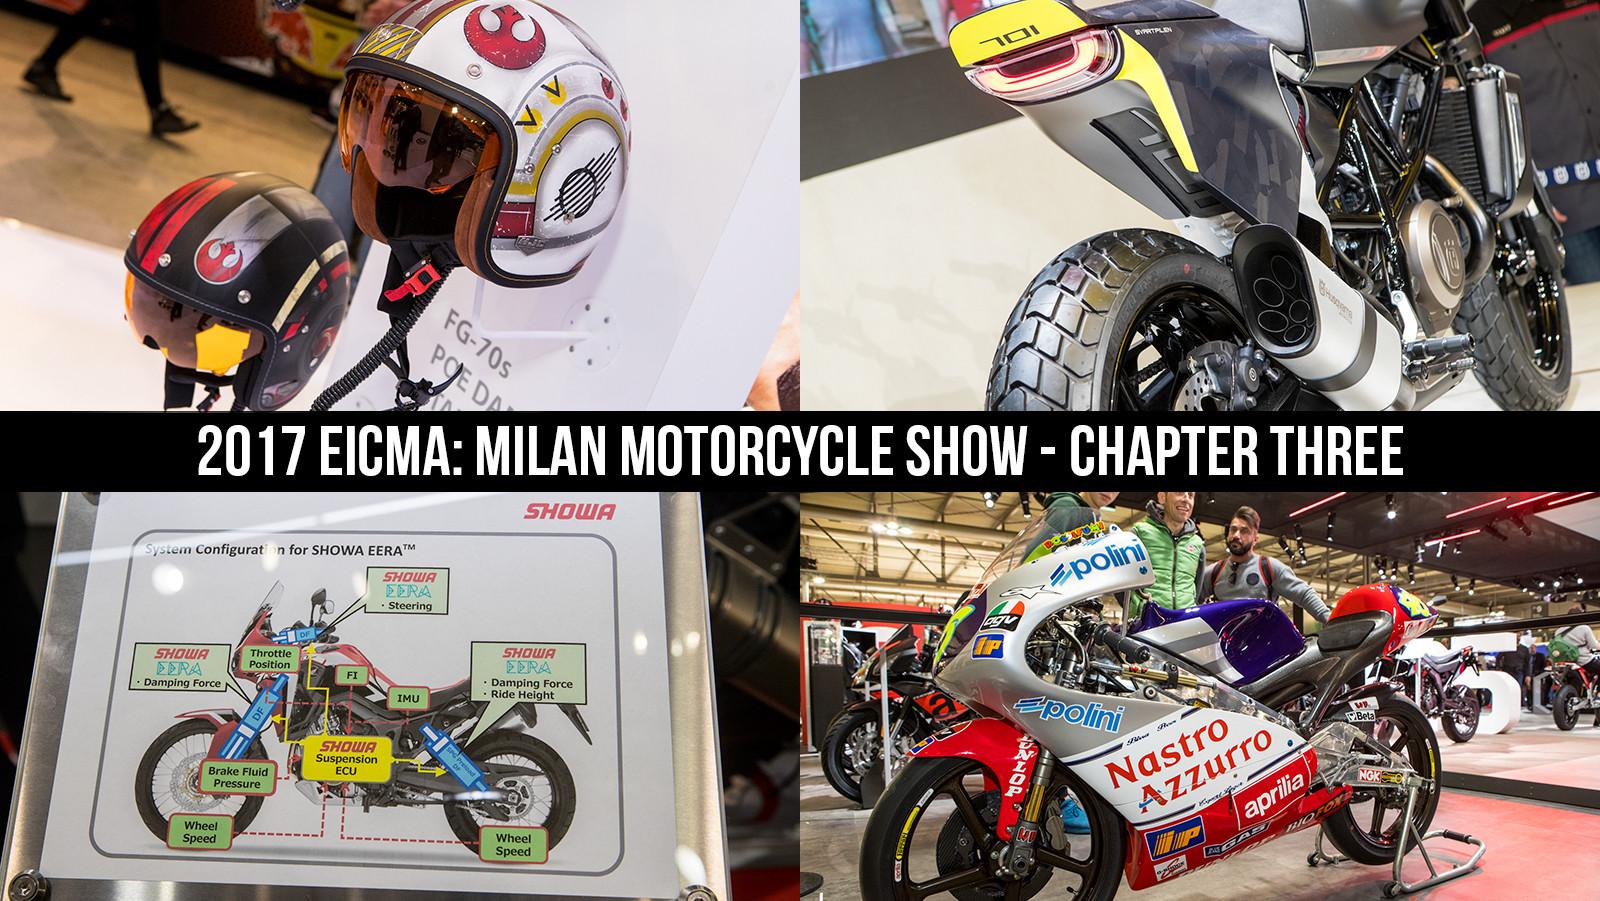 2017 EICMA - Milan Motorcycle Show: Chapter Three - 2017 EICMA - Milan Motorcycle Show: Chapter Three - Motocross Pictures - Vital MX